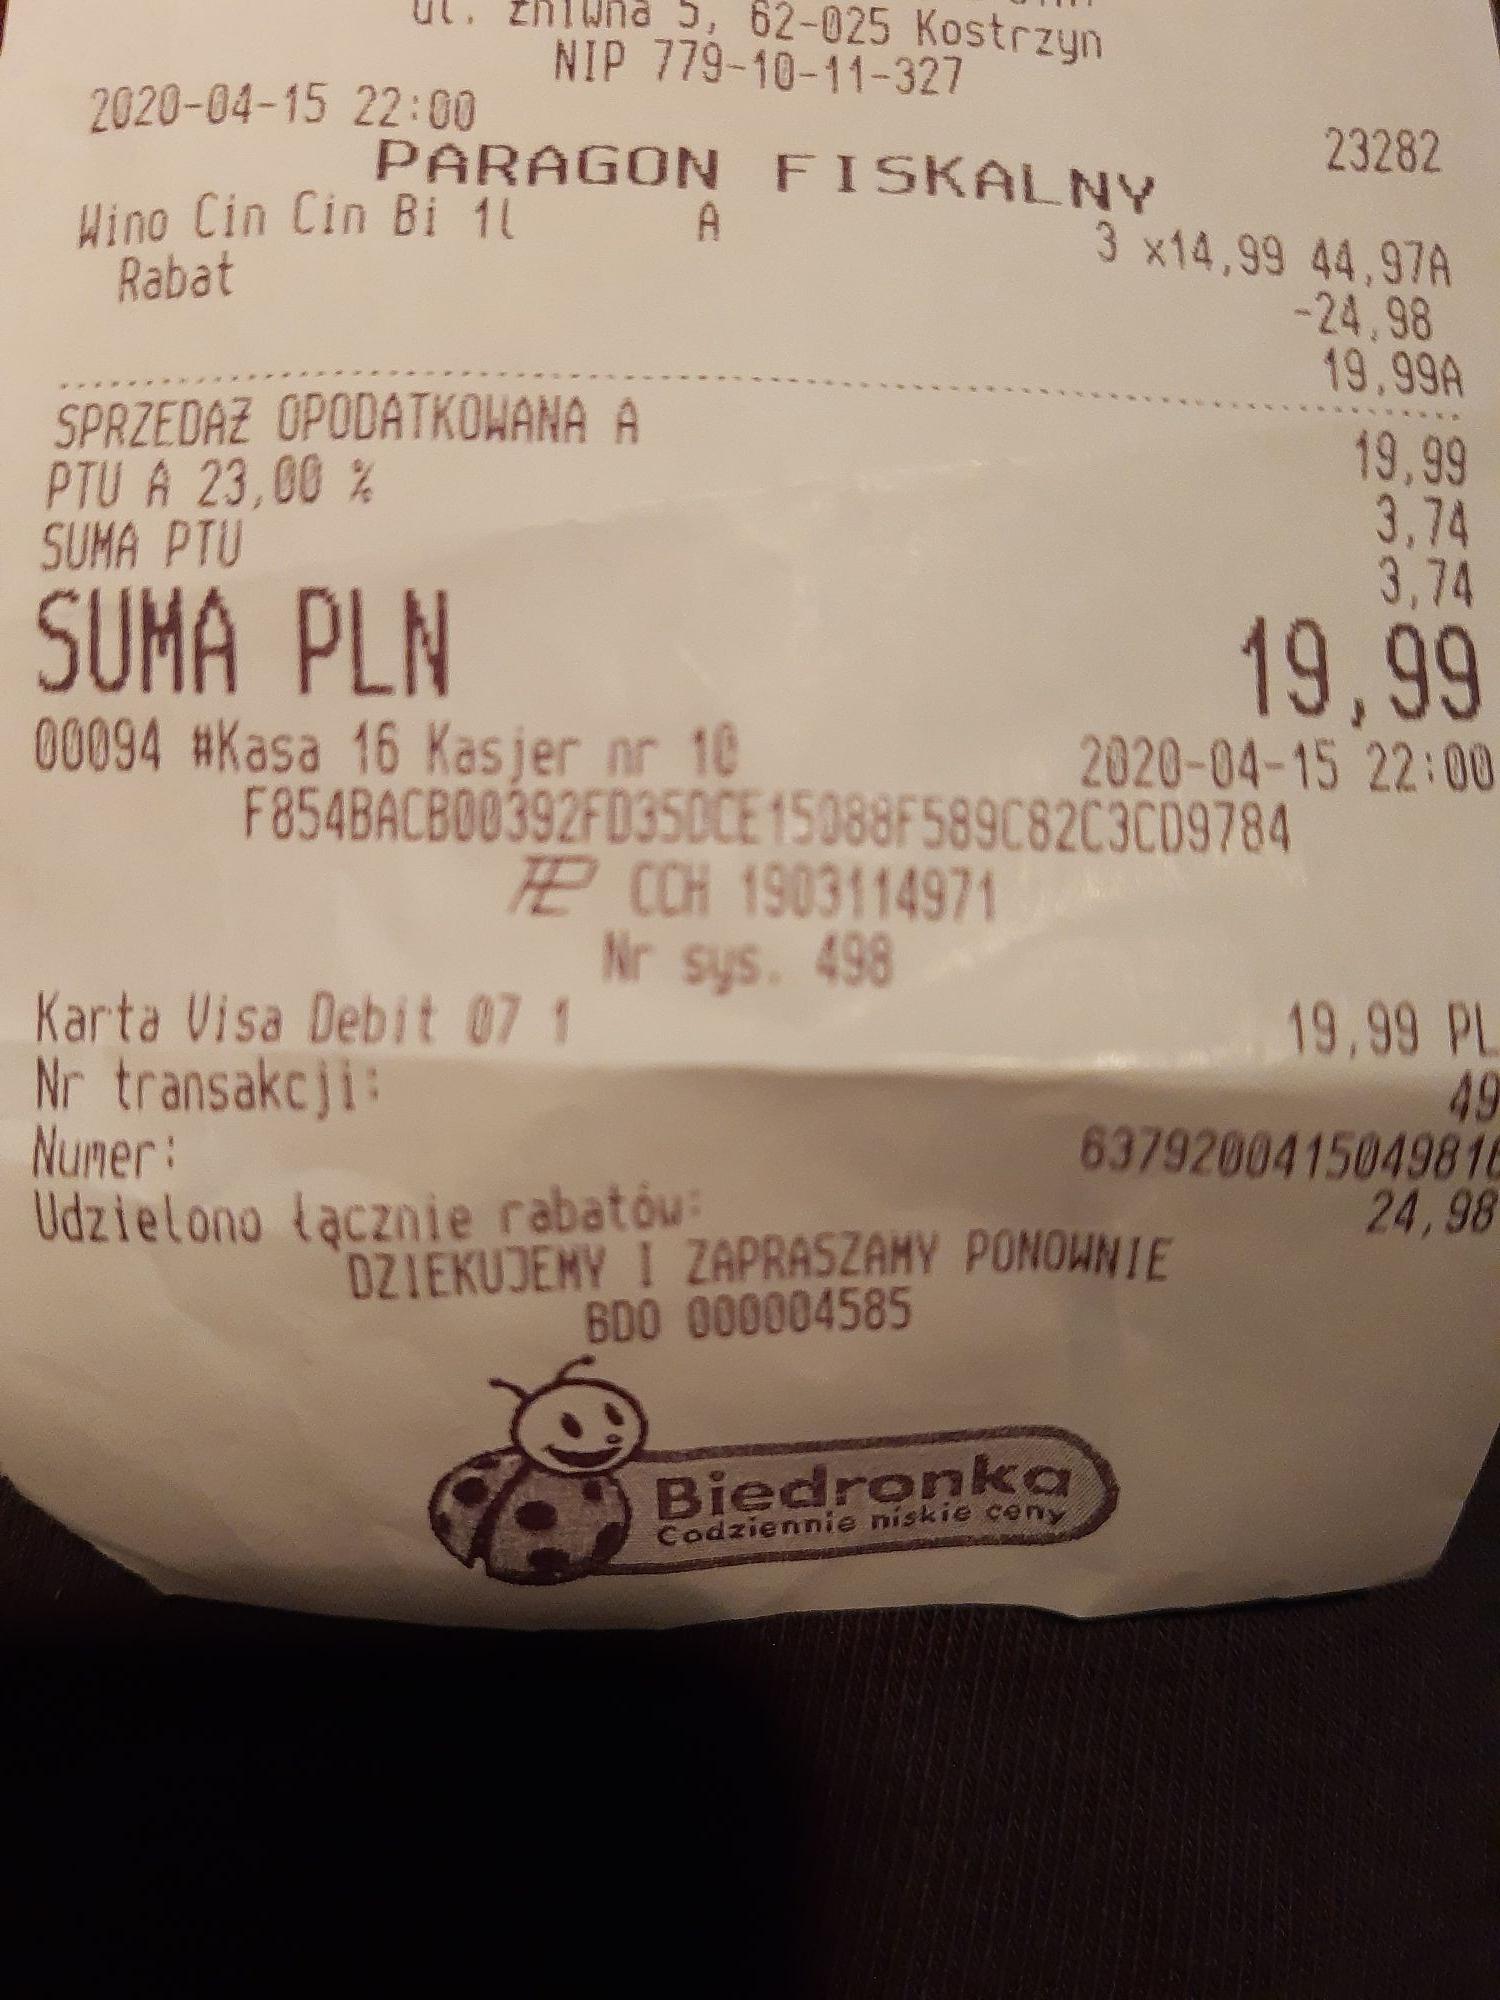 Błąd cenowy, biedronka 3 CIN CIN bianco za 19.99